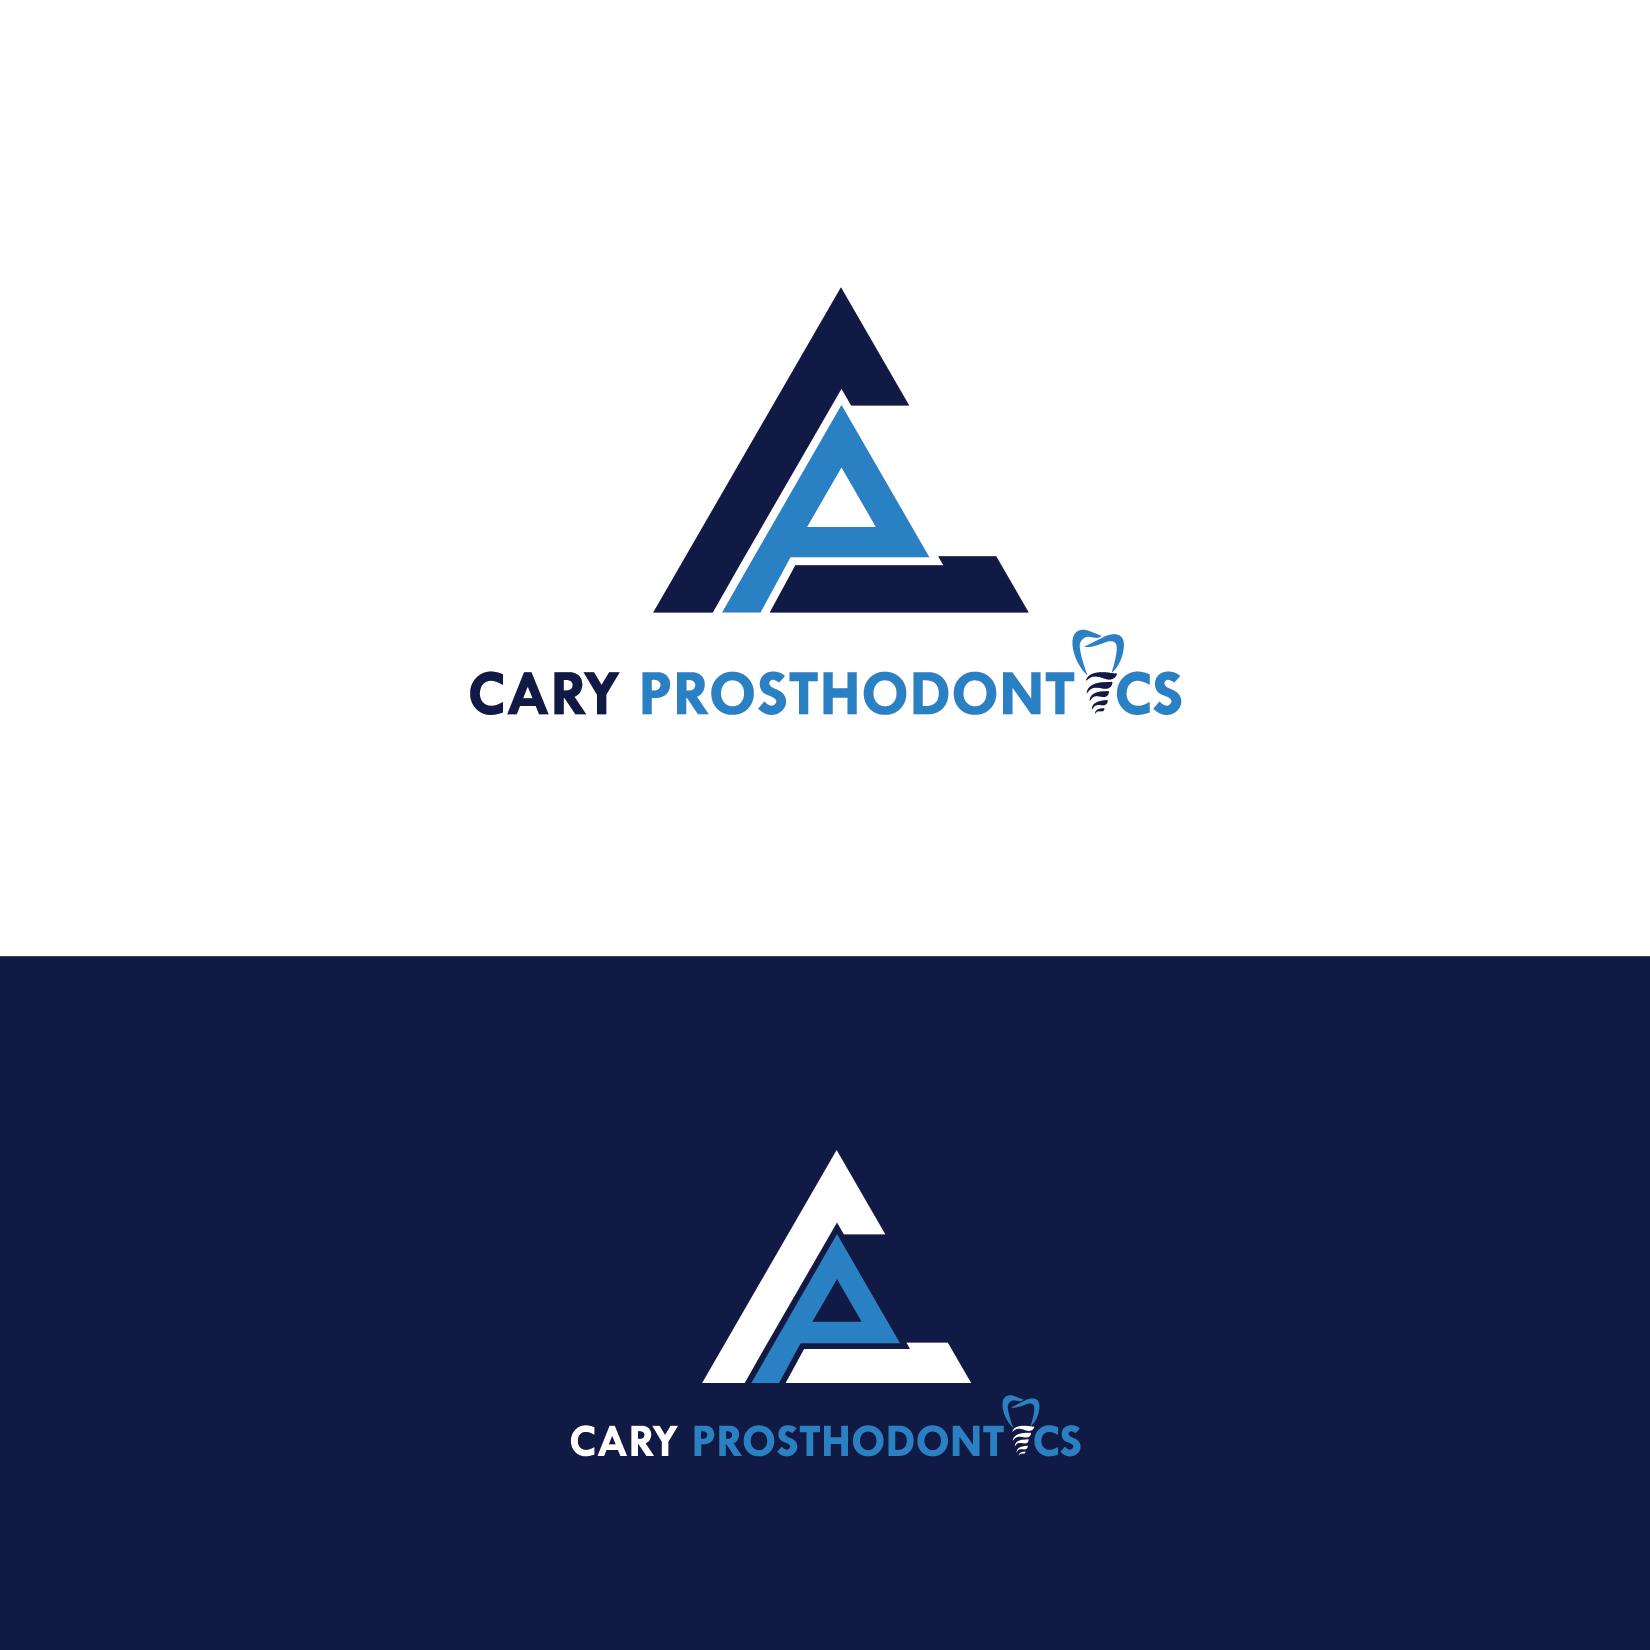 Logo Design by Private User - Entry No. 157 in the Logo Design Contest Cary Prosthodontics Logo Design.